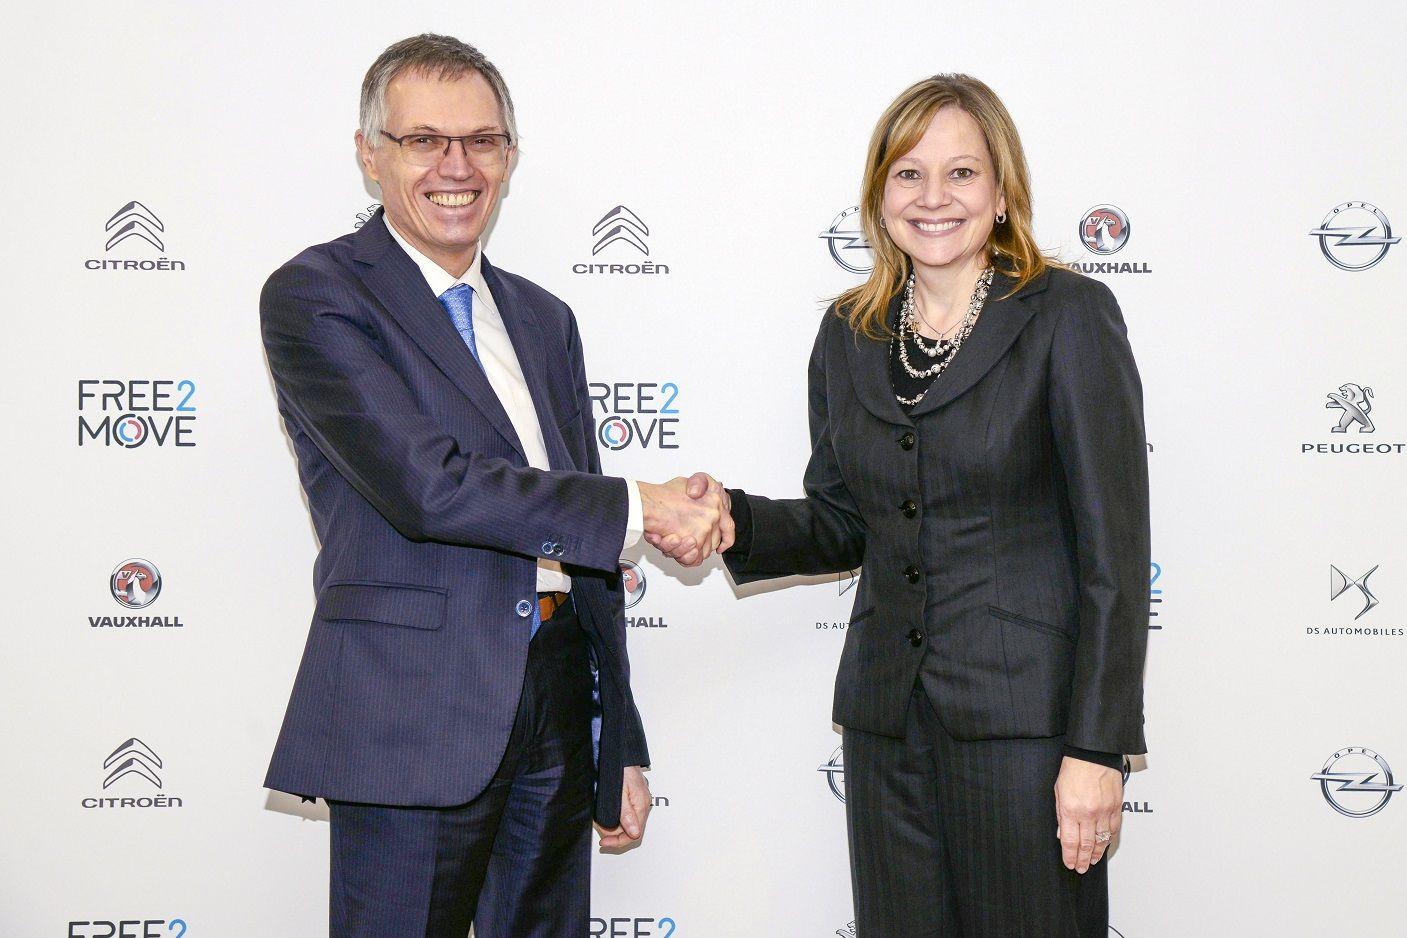 http://www.zrkuban.ru/pic/PSA-Group-CEO-Carlos-Tavares-and-GM-CEO-Mary-Barra-304742.jpg